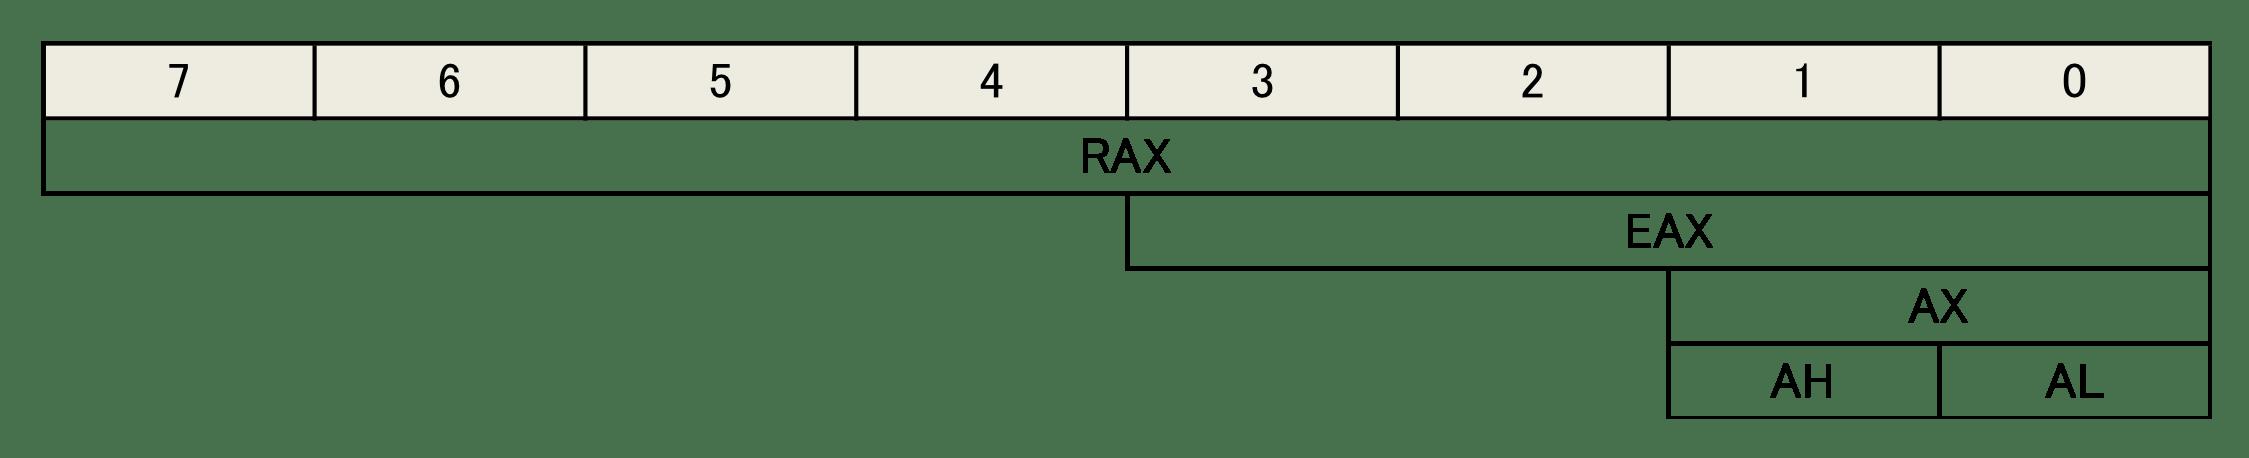 rax.png